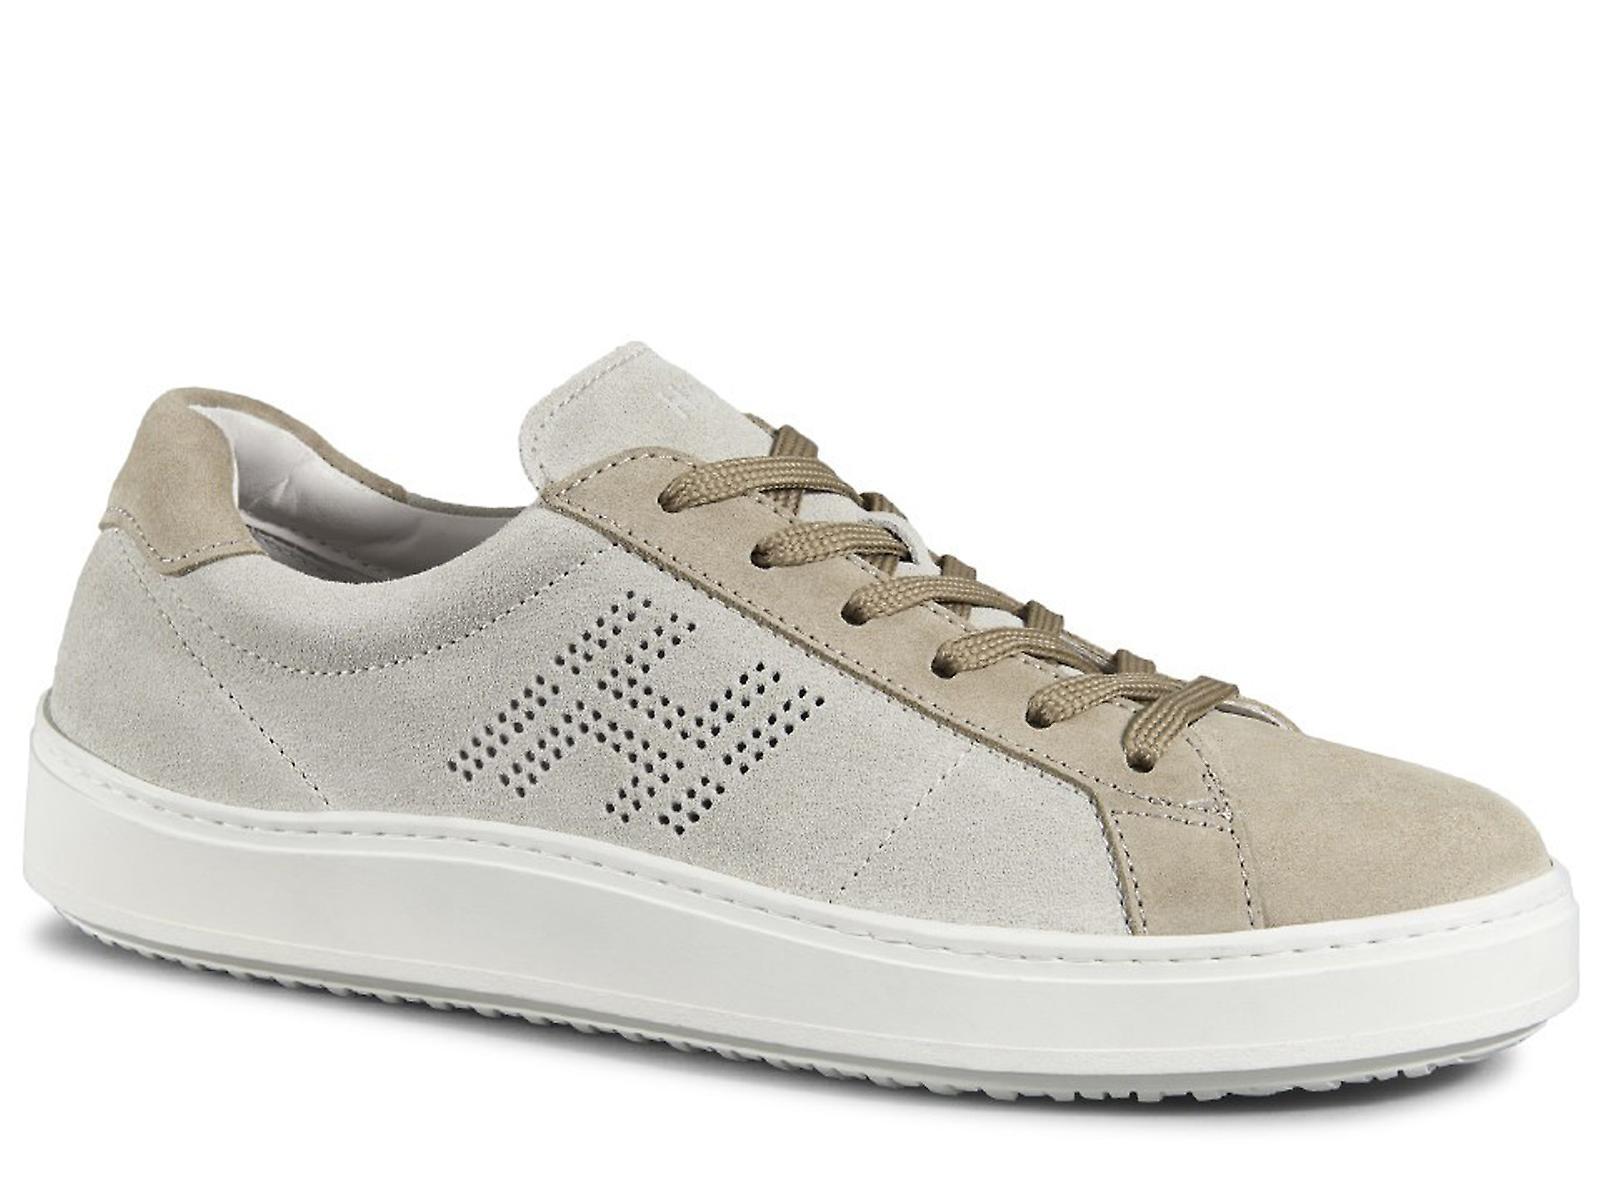 Hogan H302 men's sneakers shoes in beige suede leather